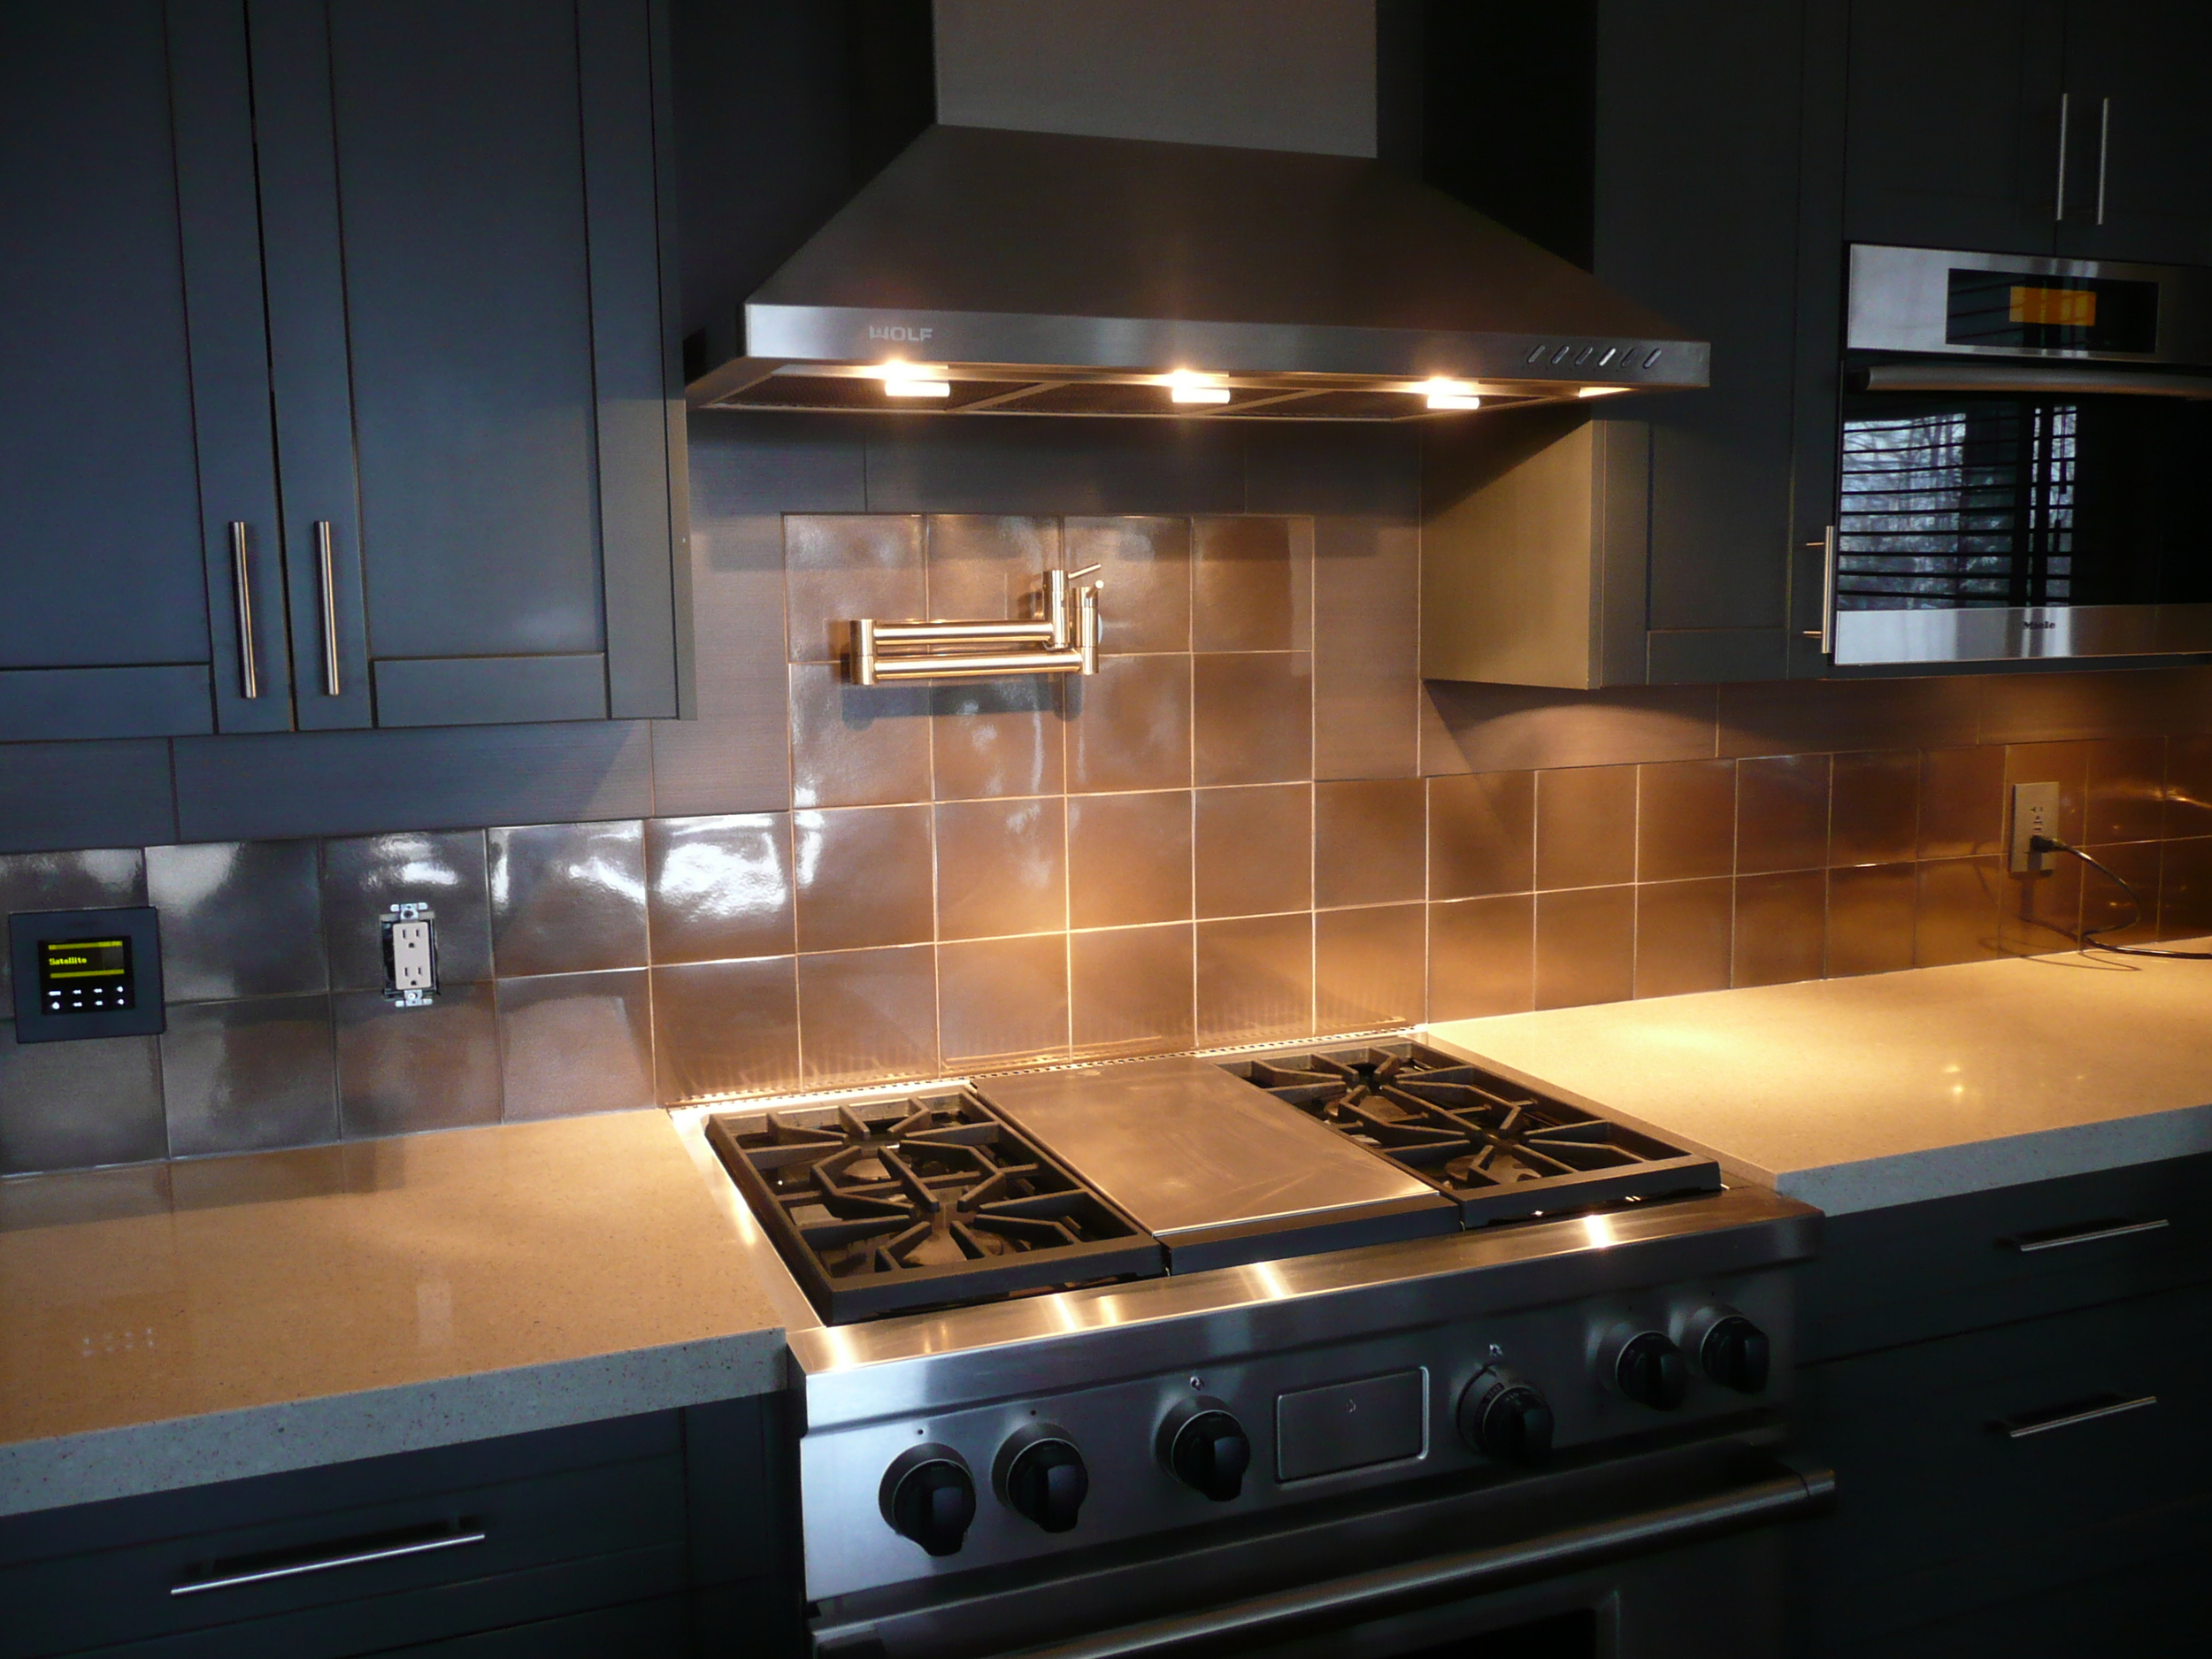 Stainless steel range and hood, steel look tile and porcelain backsplash.